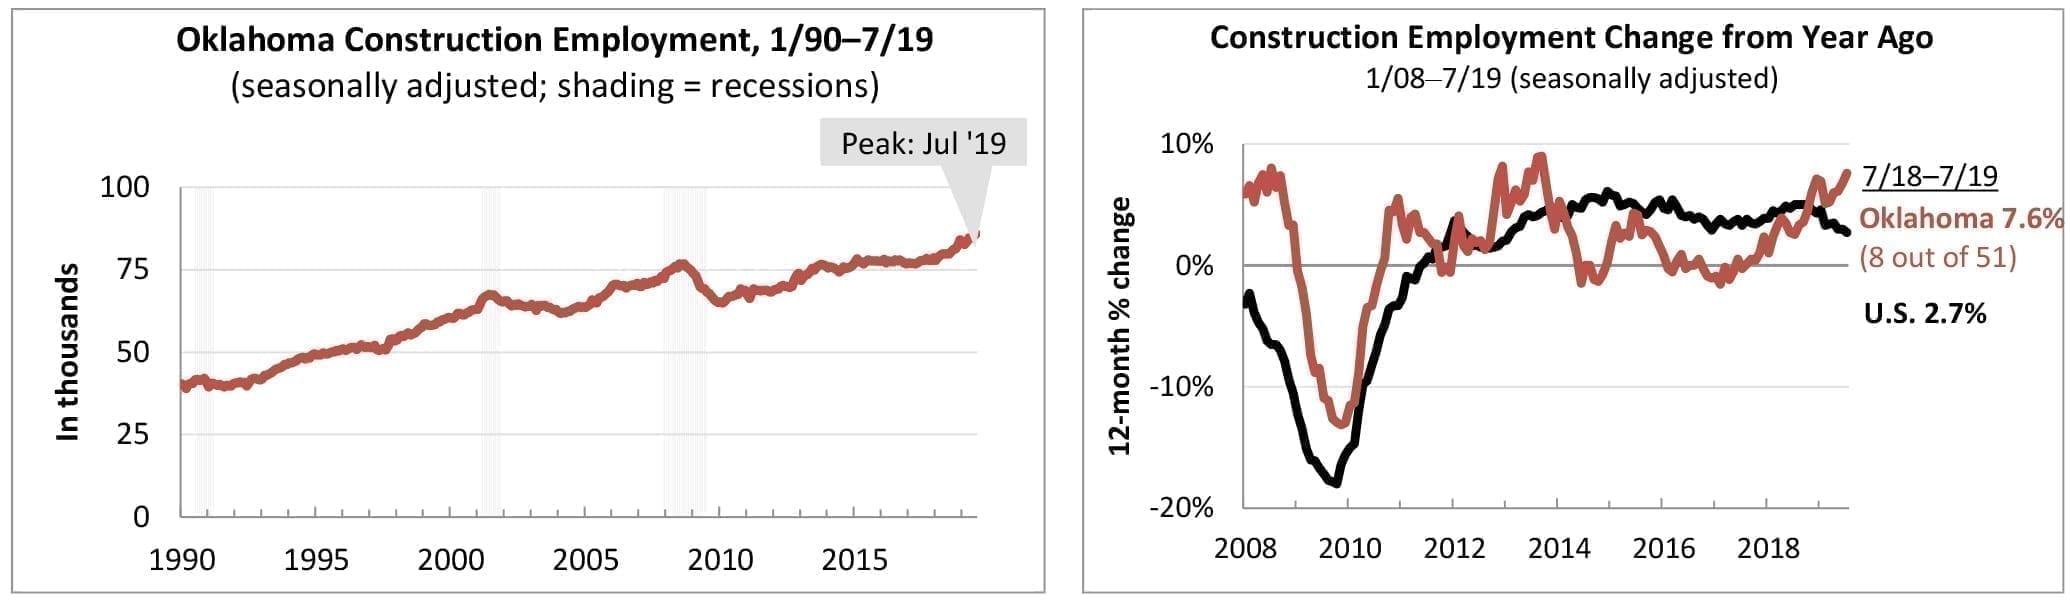 Oklahoma_Construction_Employment